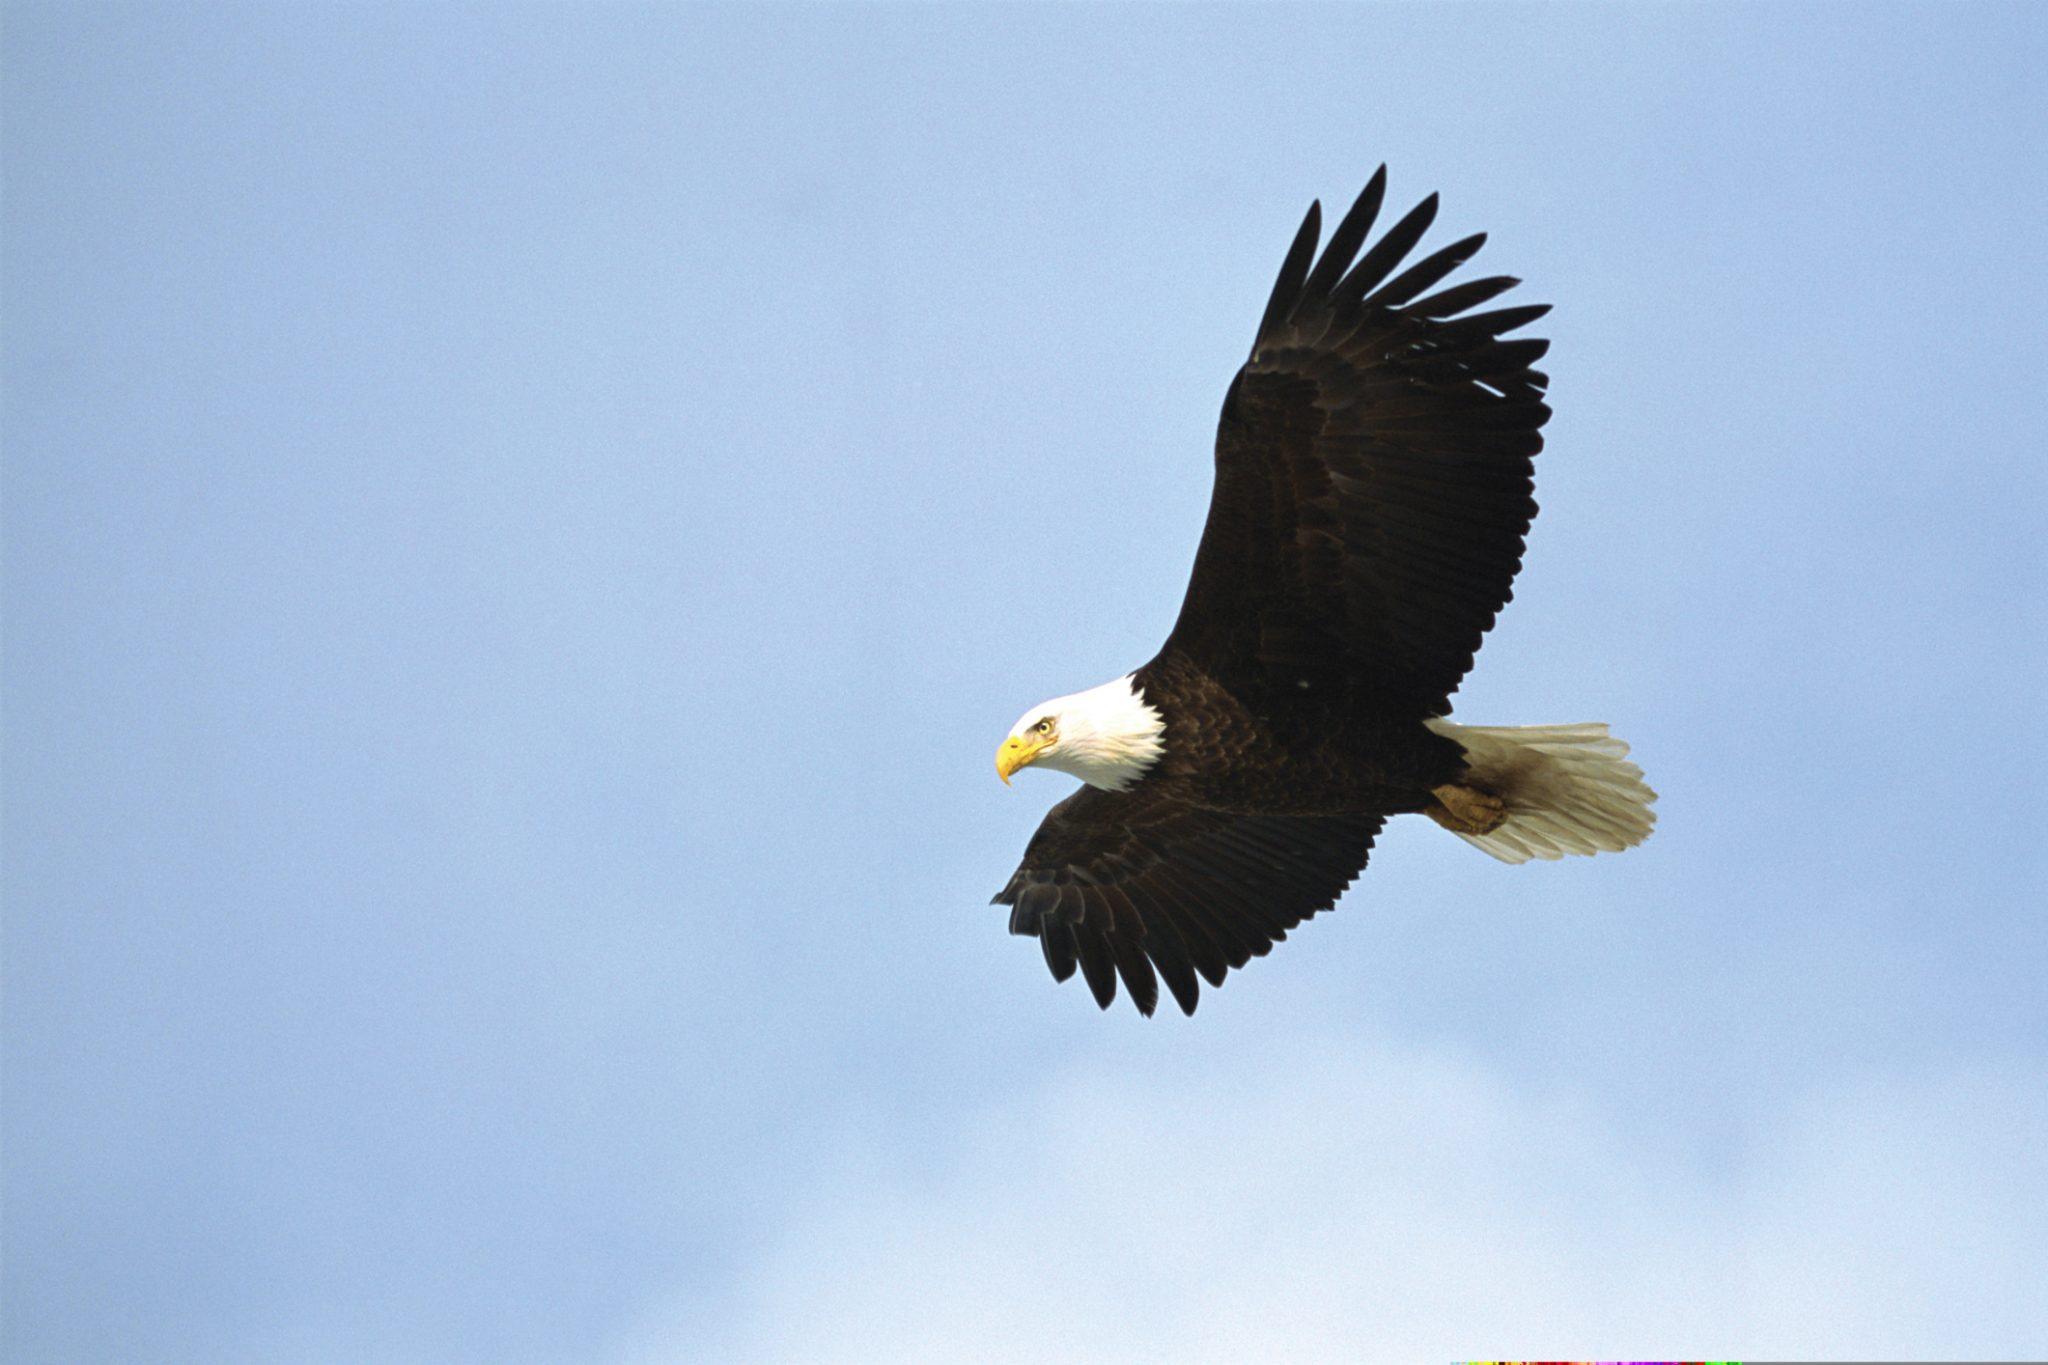 Bald eagle flying, Alaska, US